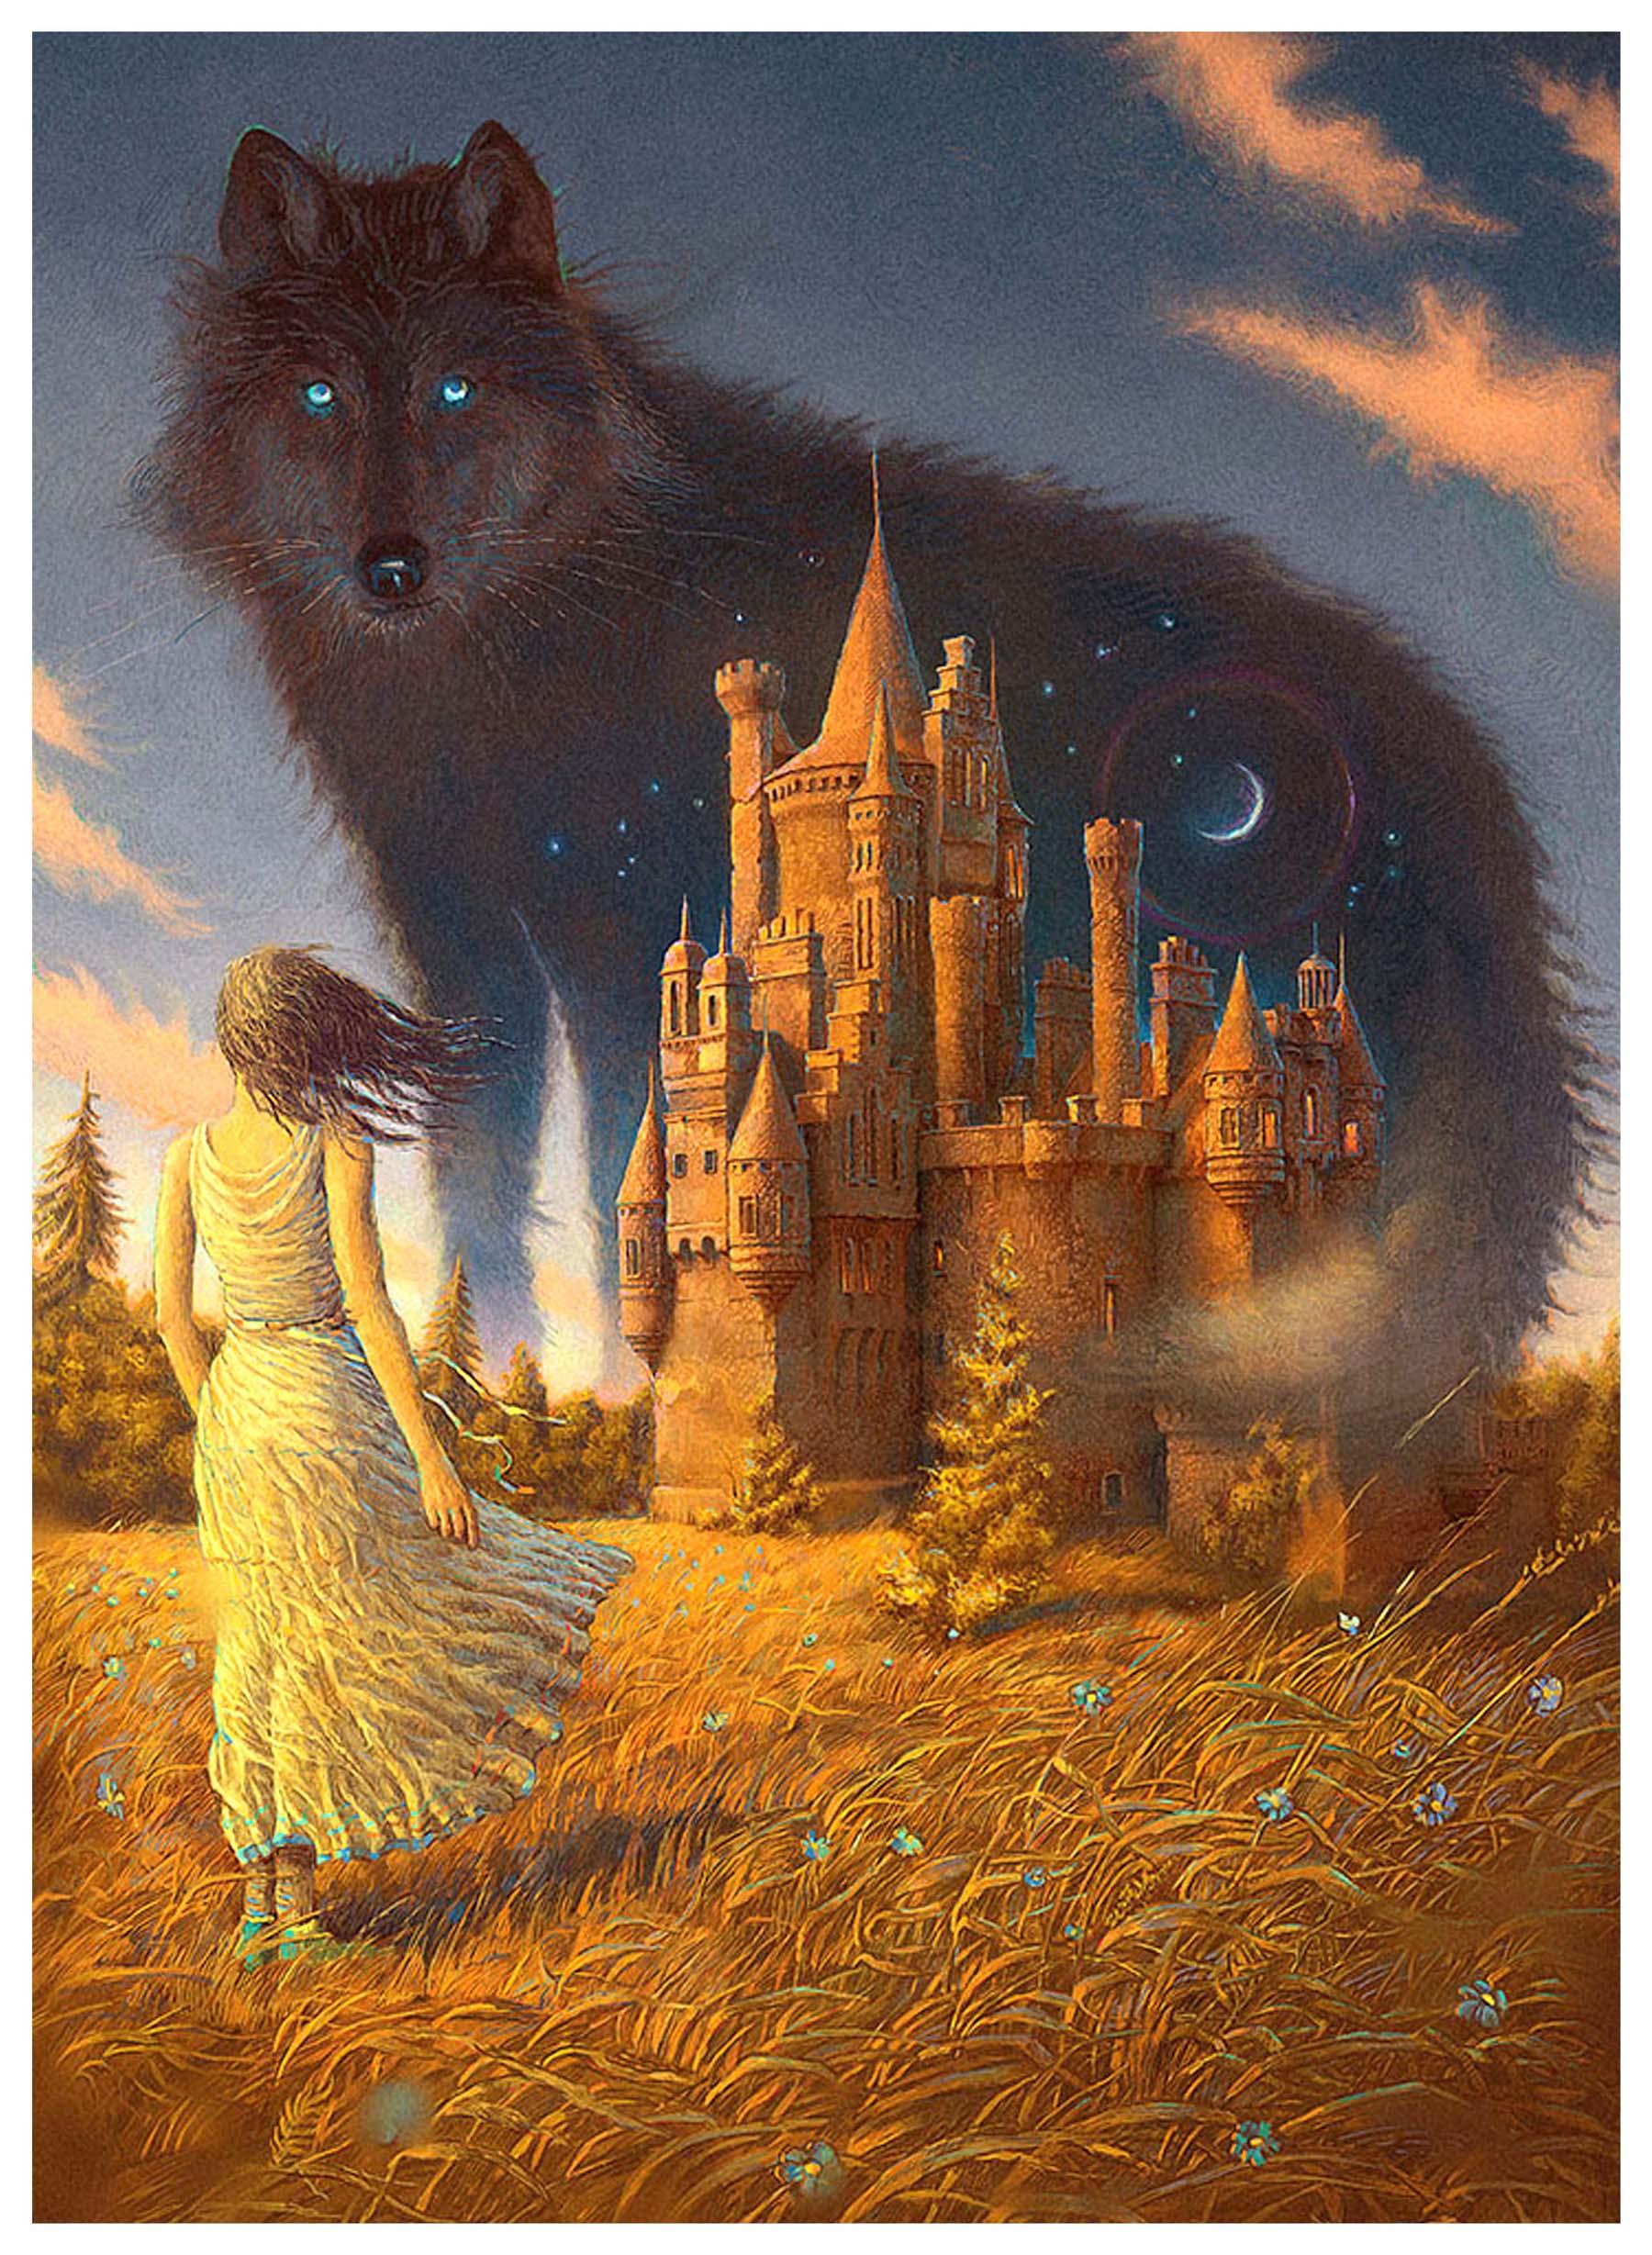 m-wolf-andrew-ferez